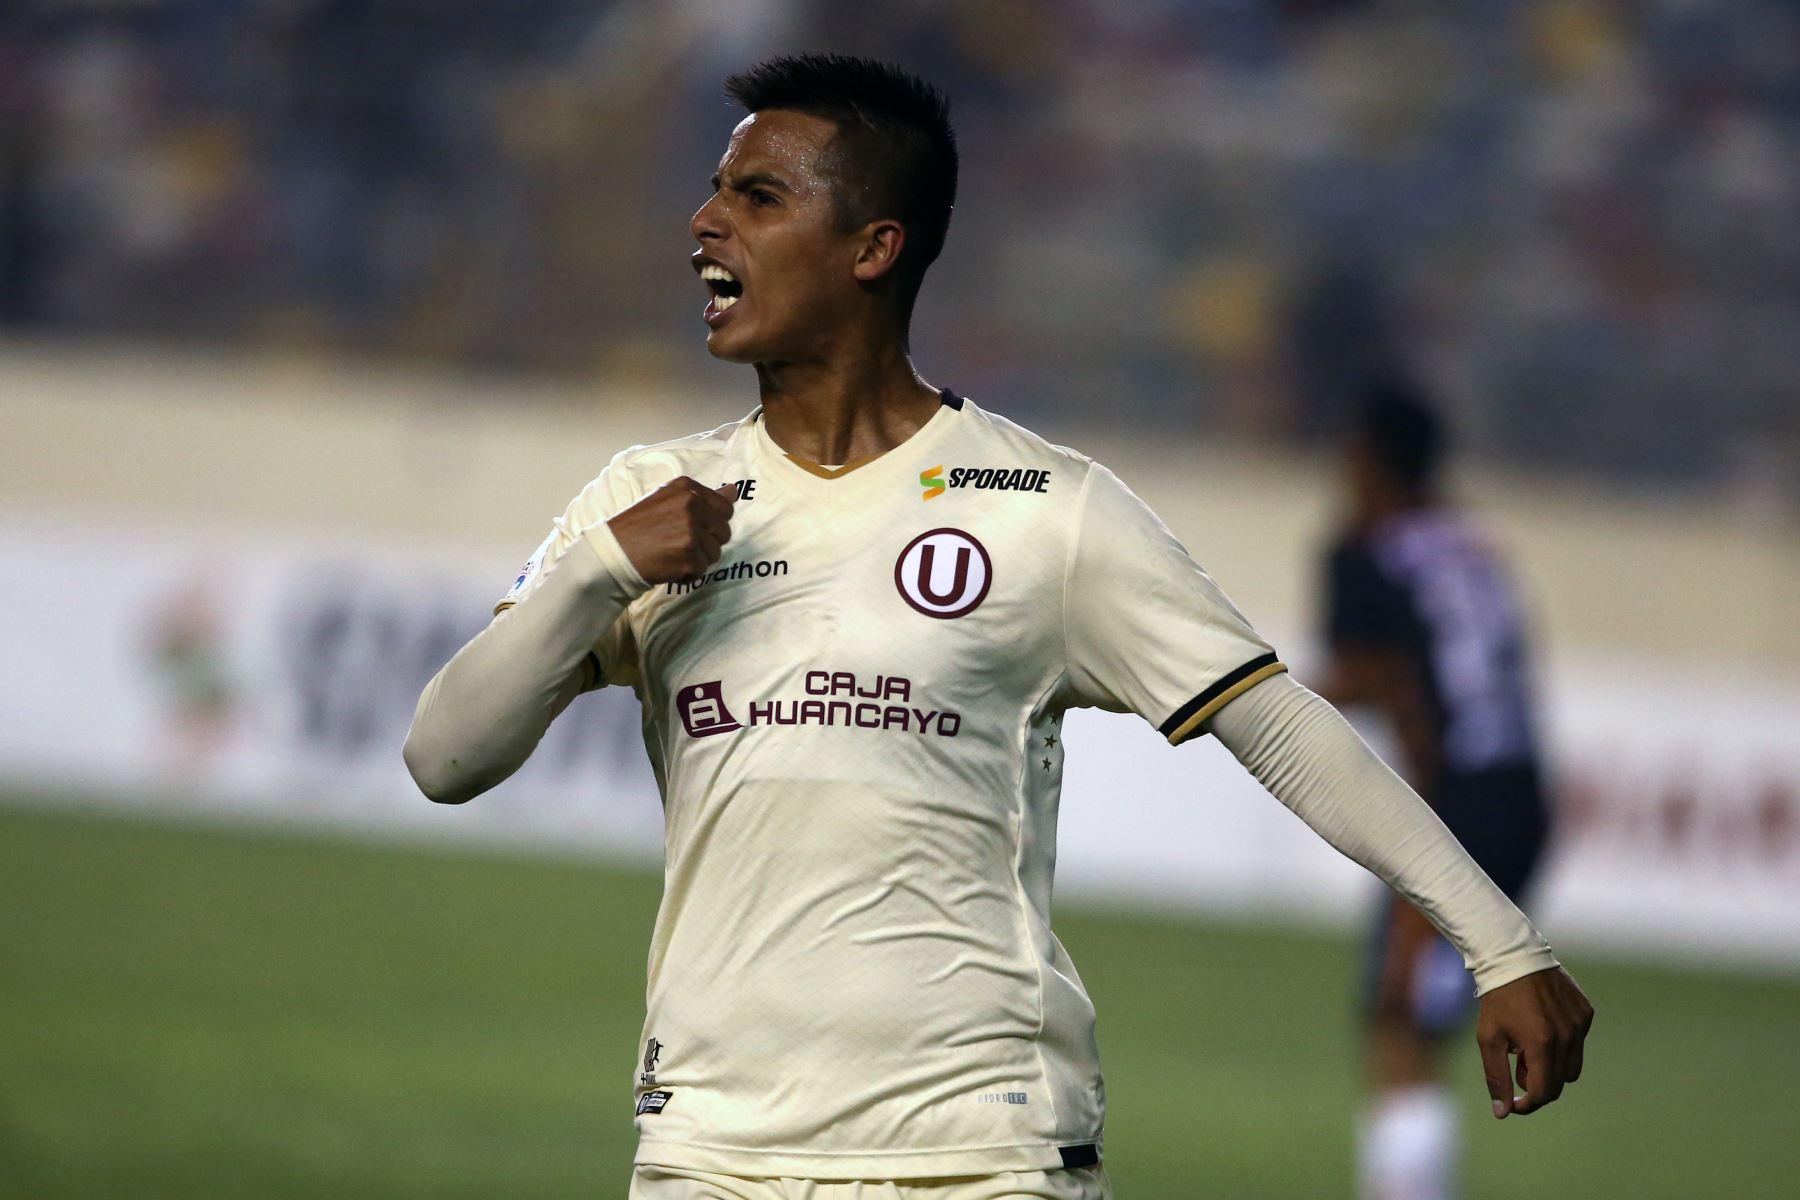 Anthony Osorio celebra el gol de Universitario ante Ayacucho FC. Foto: ANDINA/Vidal Tarqui